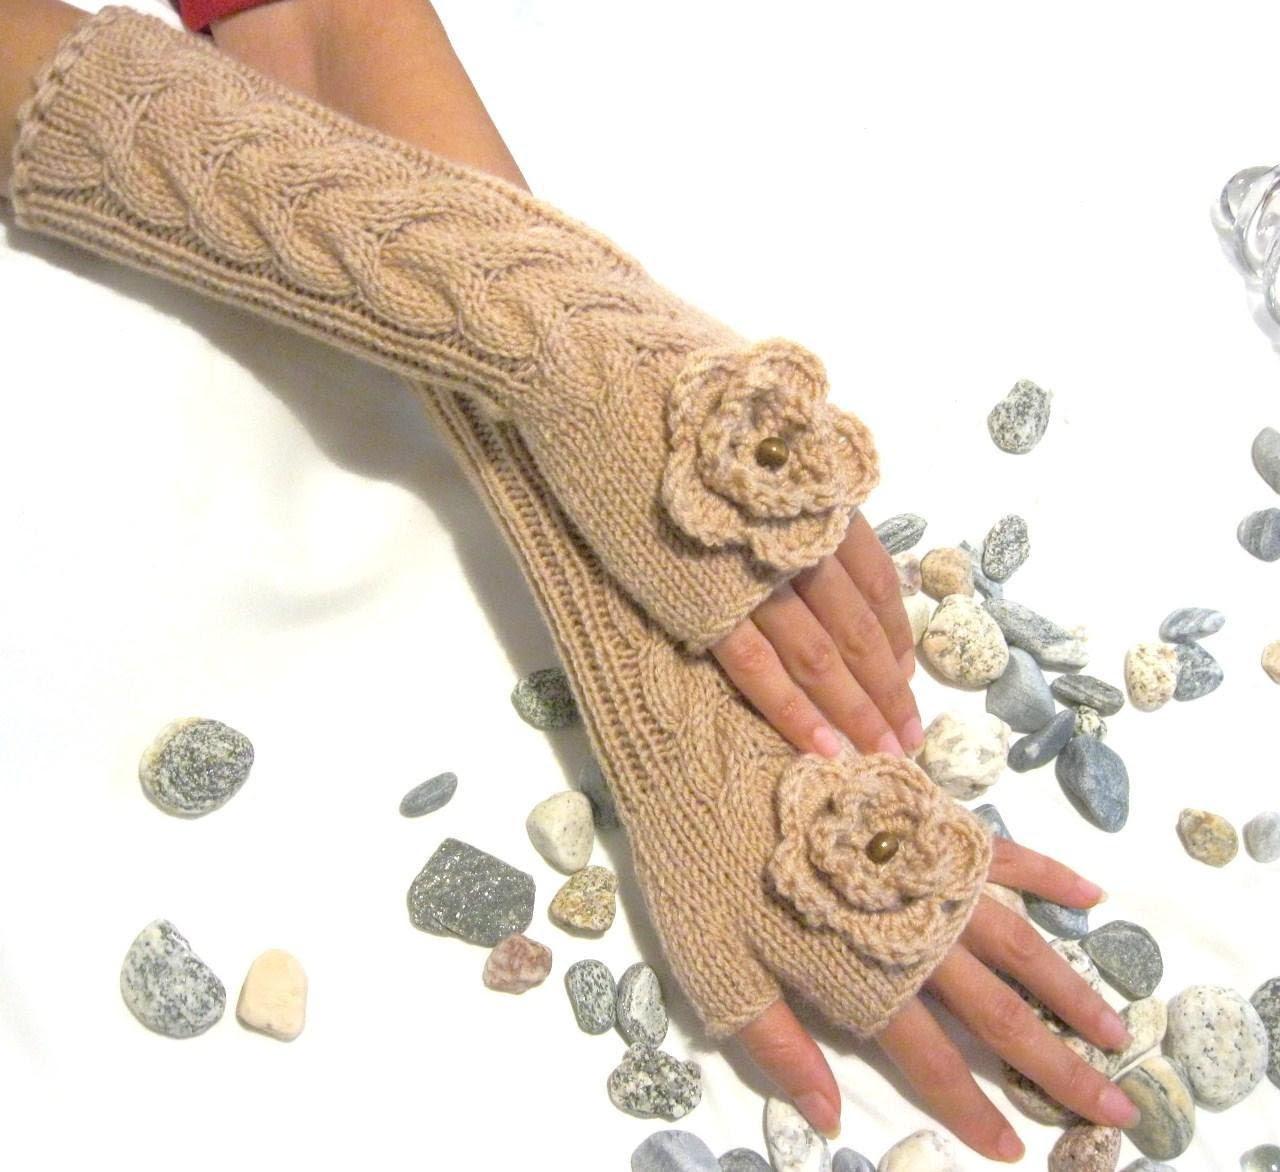 BEIGE LONG Fingerless Gloves with a flower